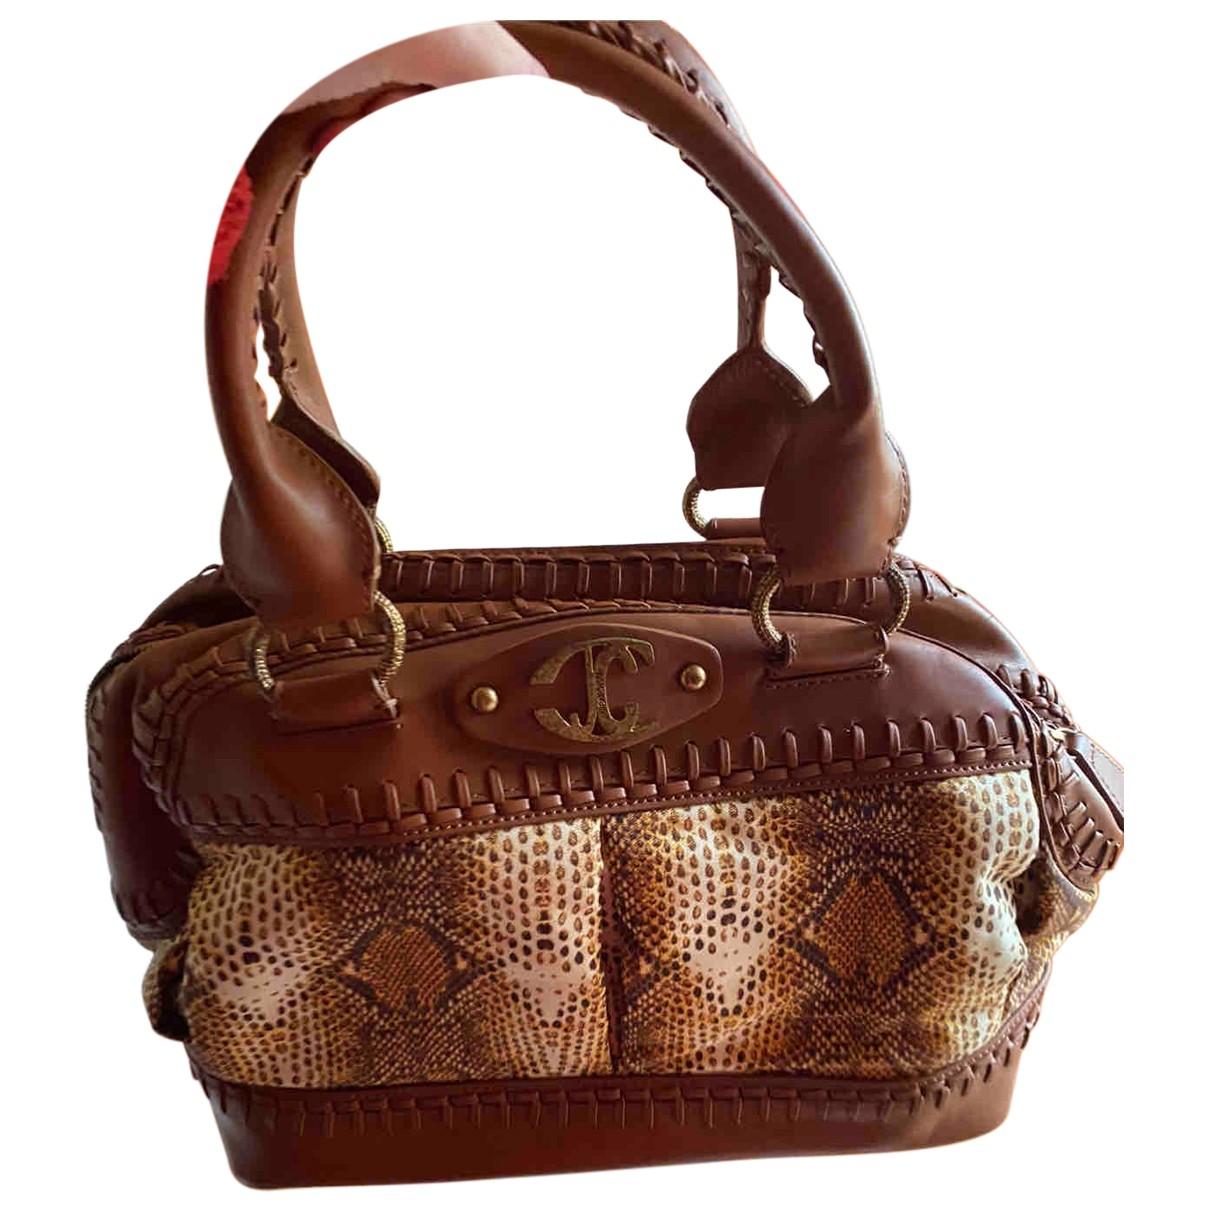 Just Cavalli N Beige Leather handbag for Women N